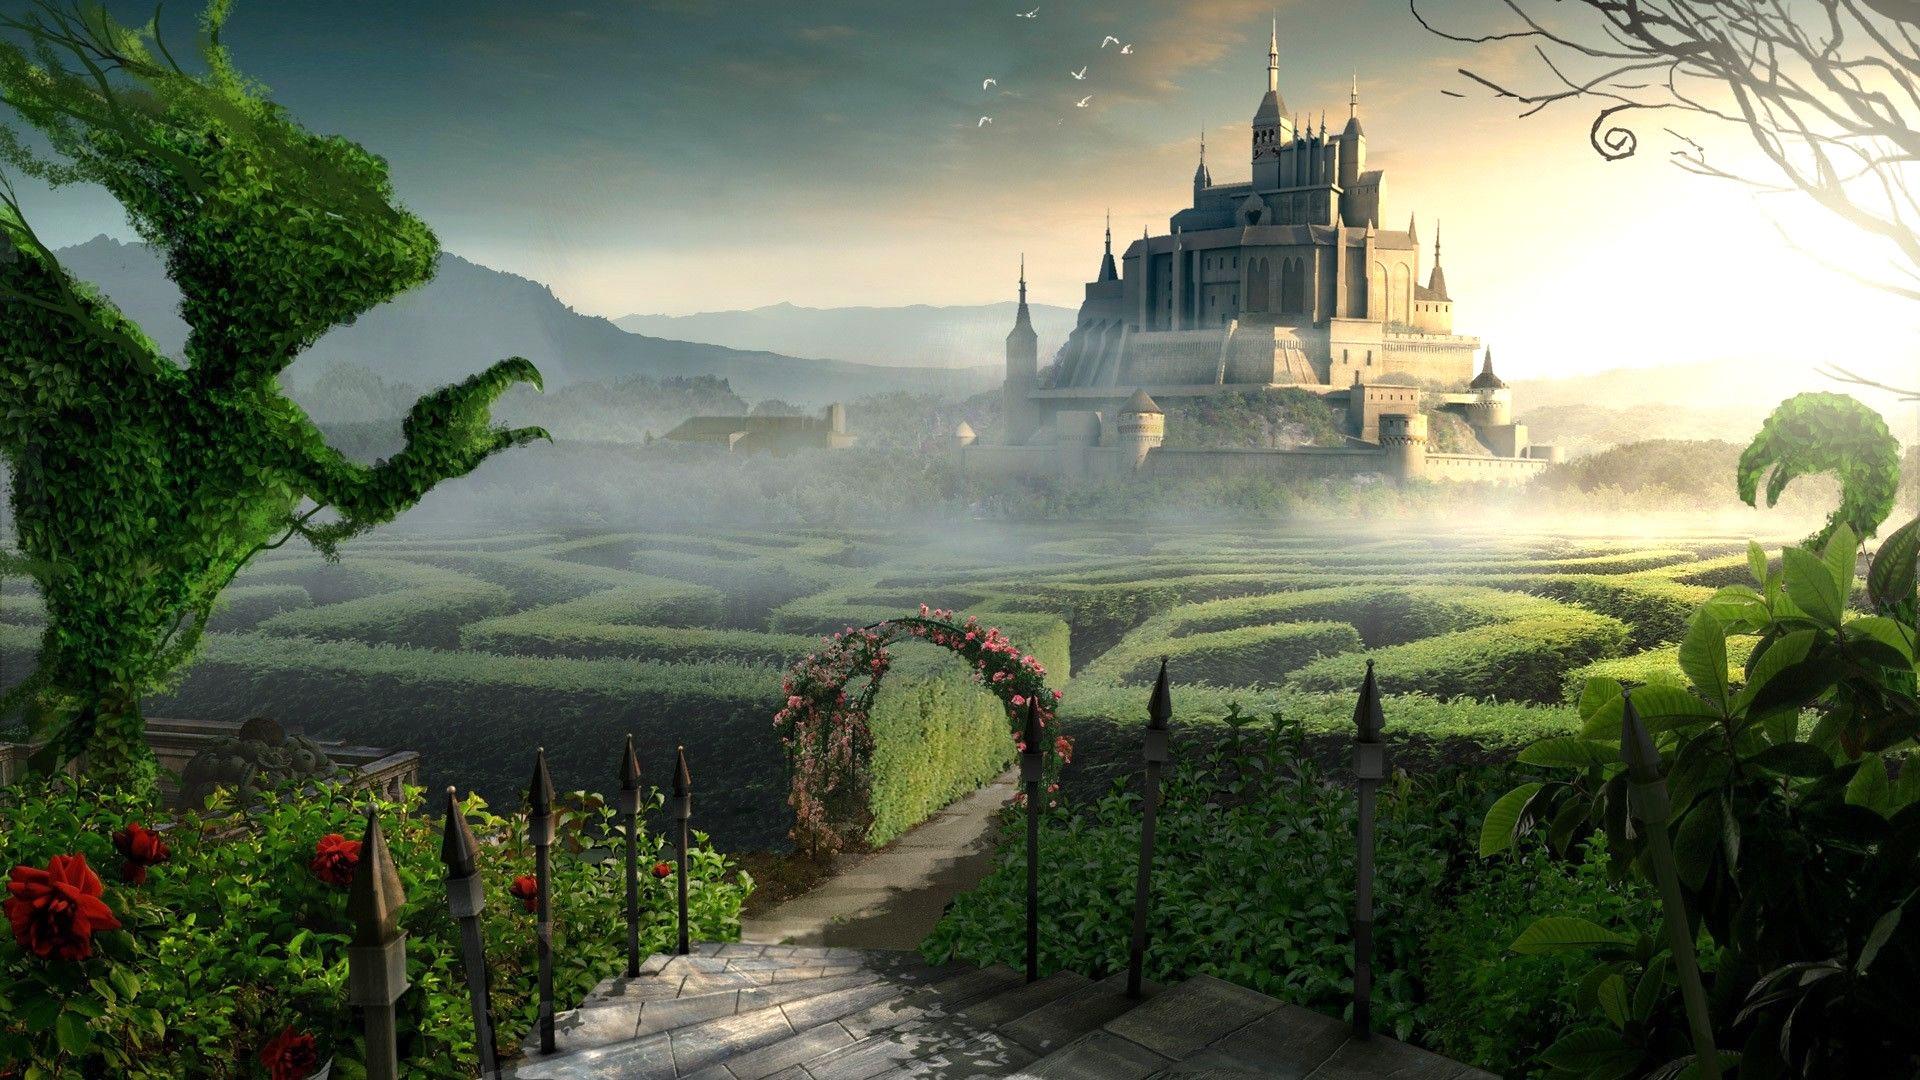 castle%20landscape_edited.jpg